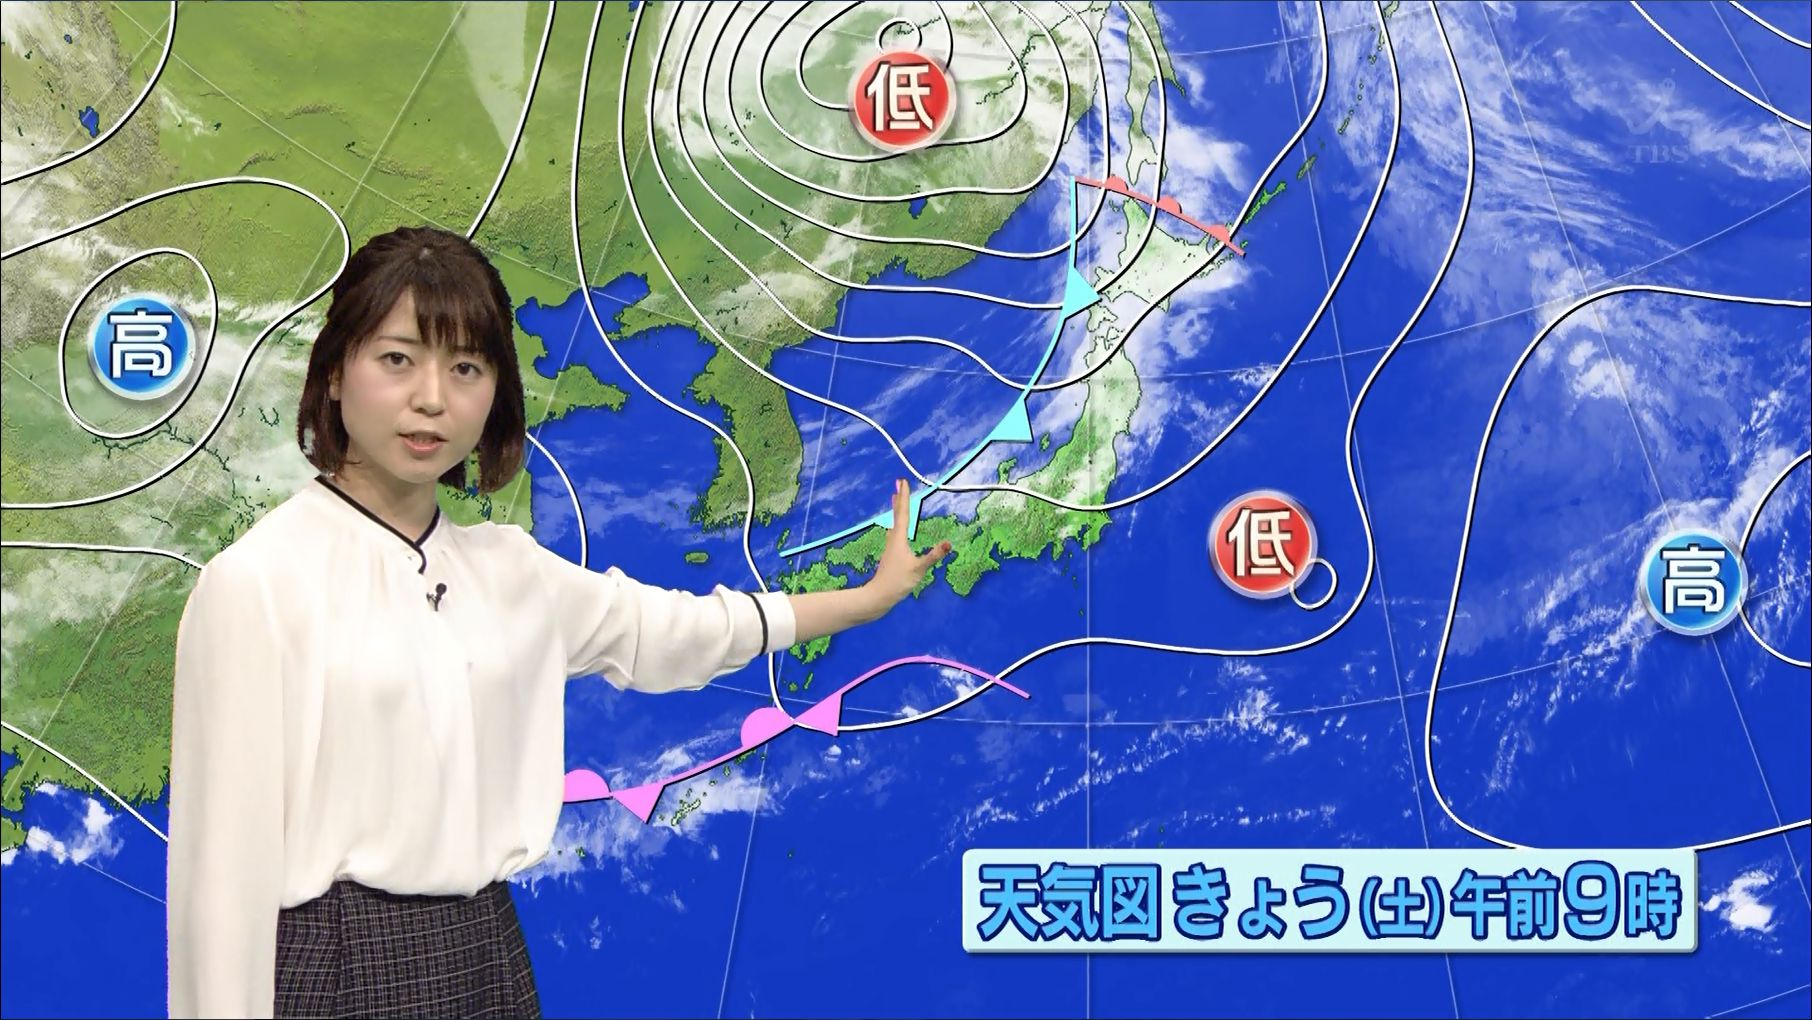 宮崎由衣子の画像 p1_35